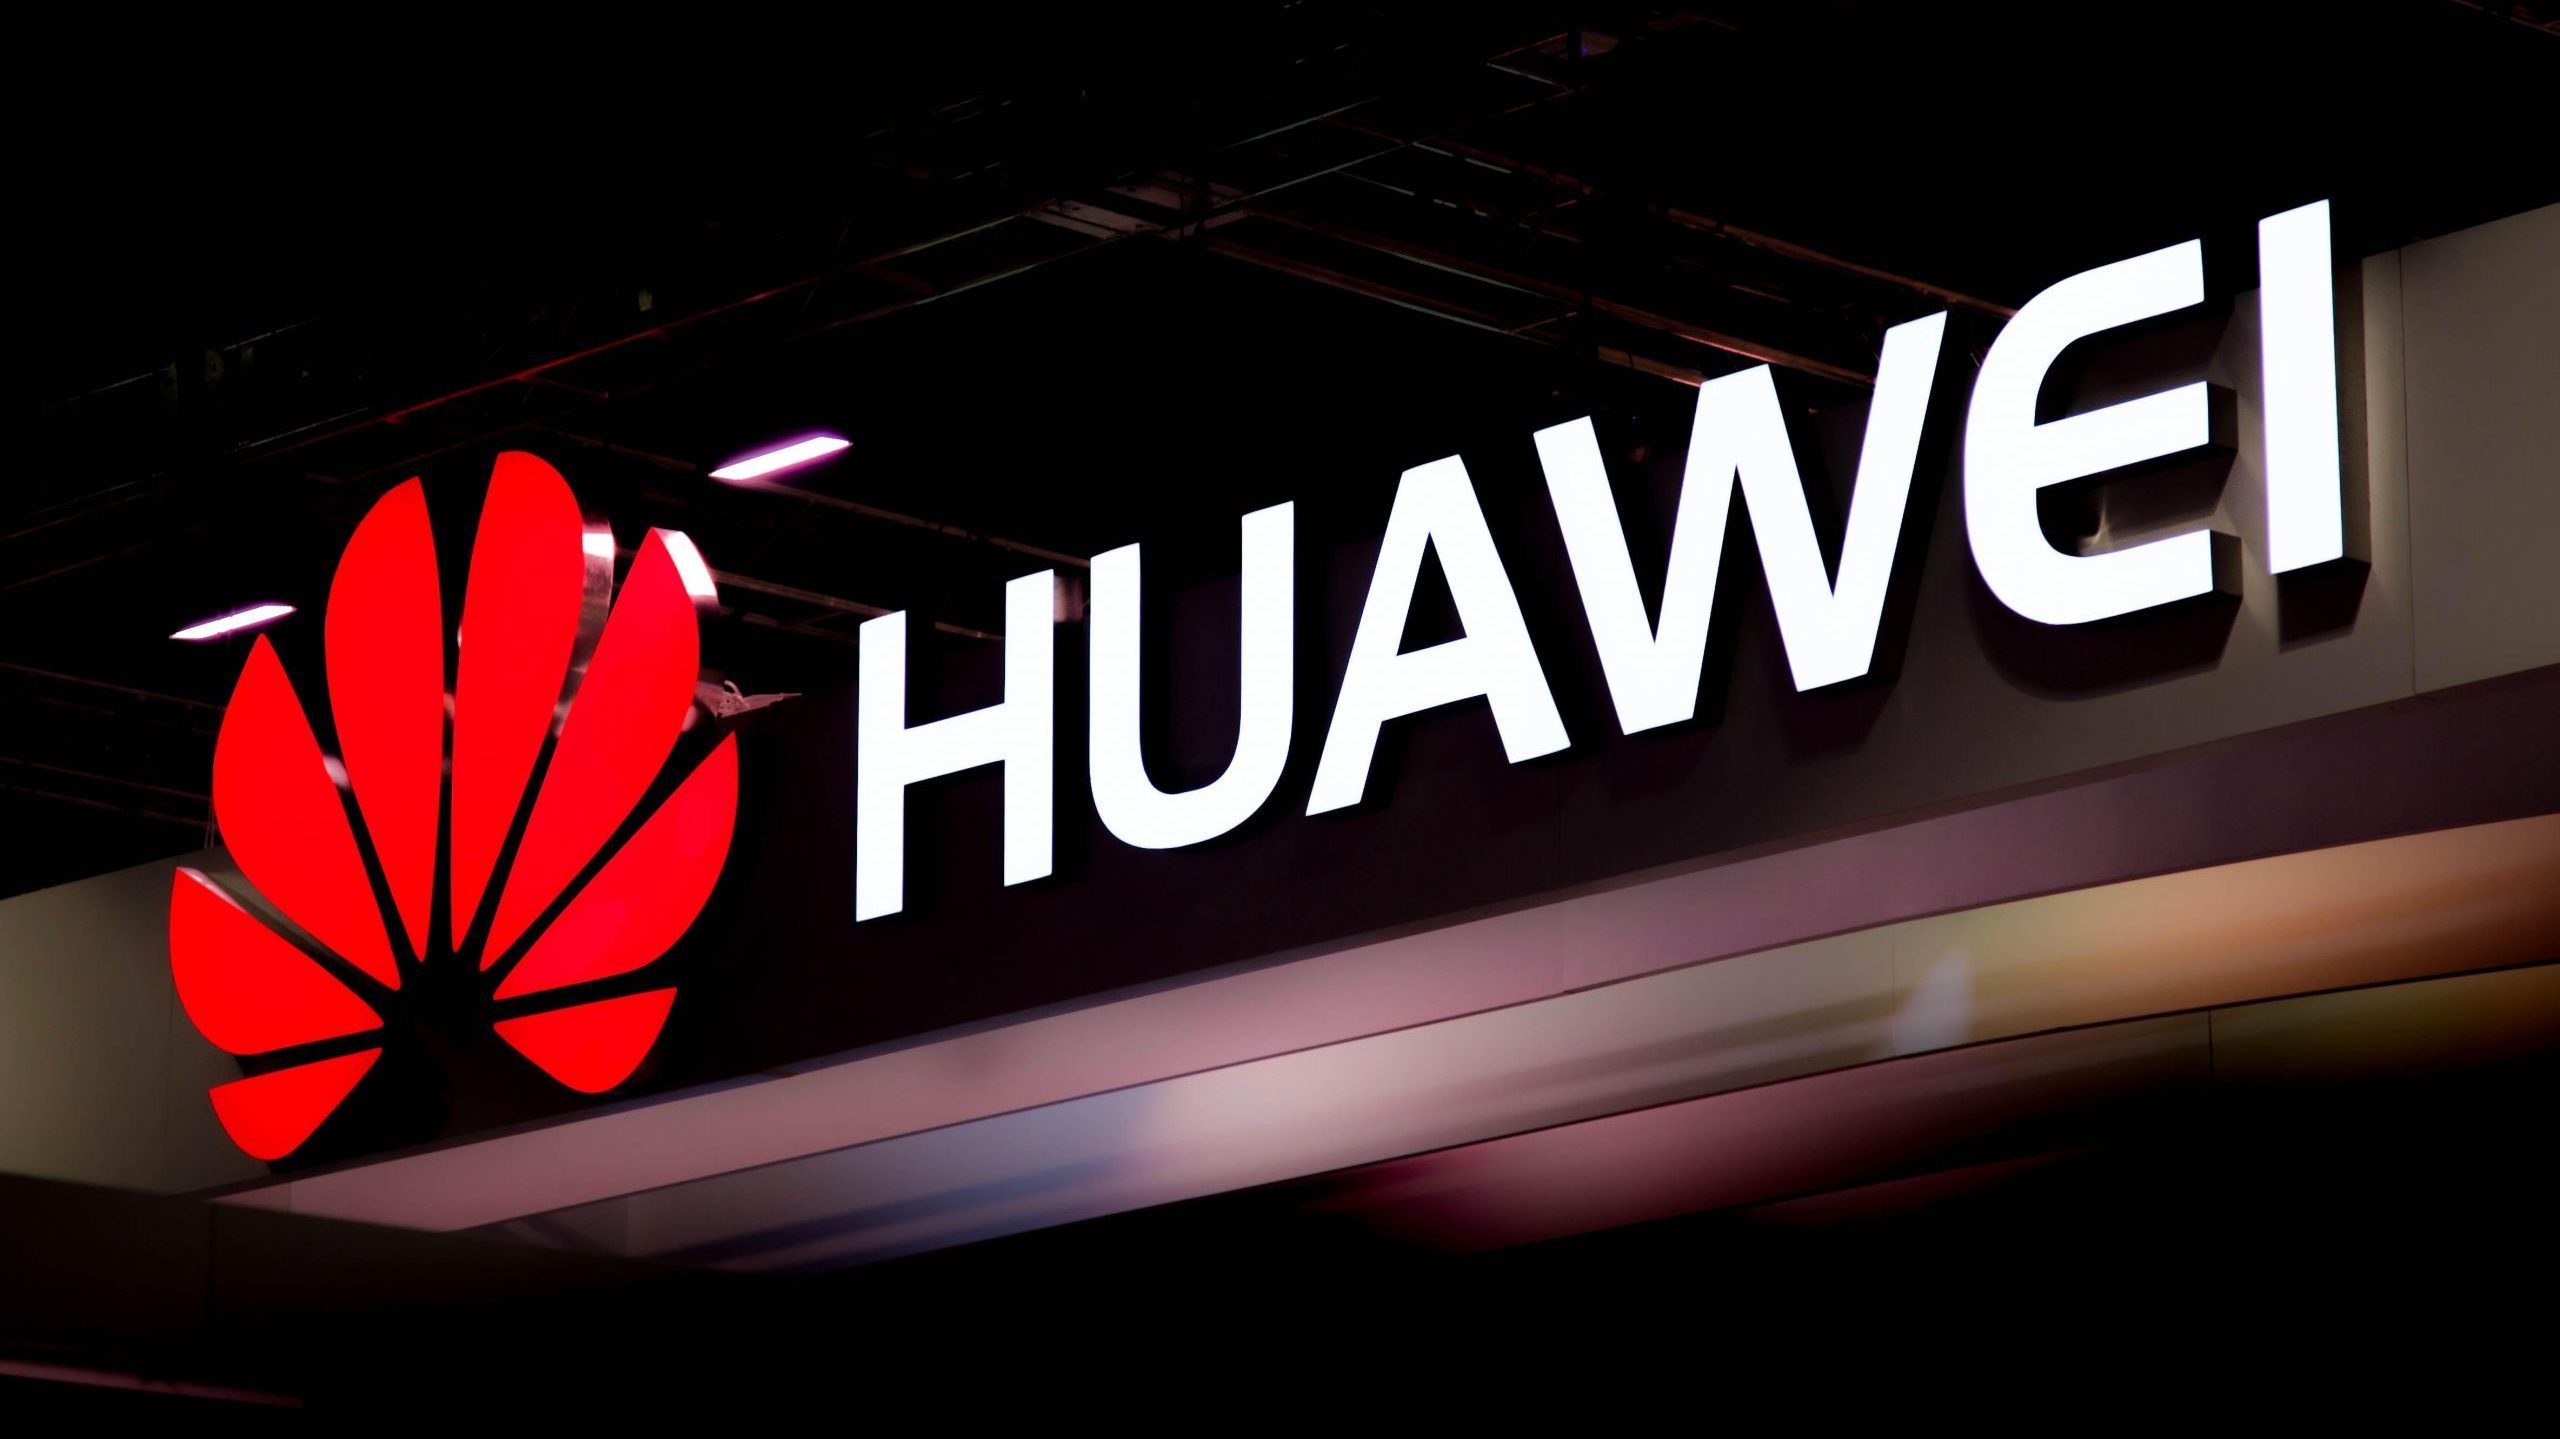 Gobierno malayo anuncia construcción de red 5G con apoyo de Huawei